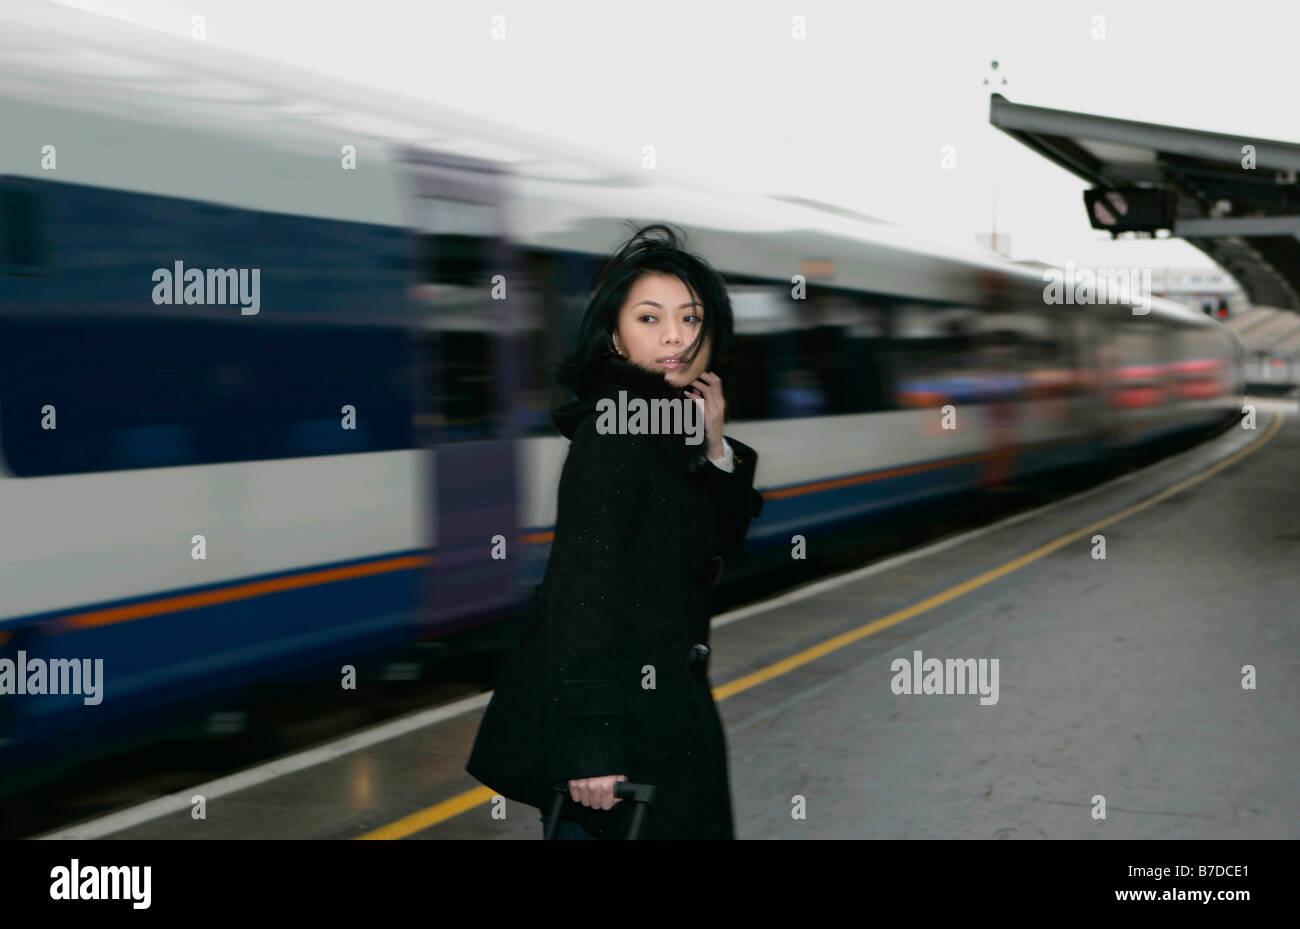 Woman on train platform - Stock Image